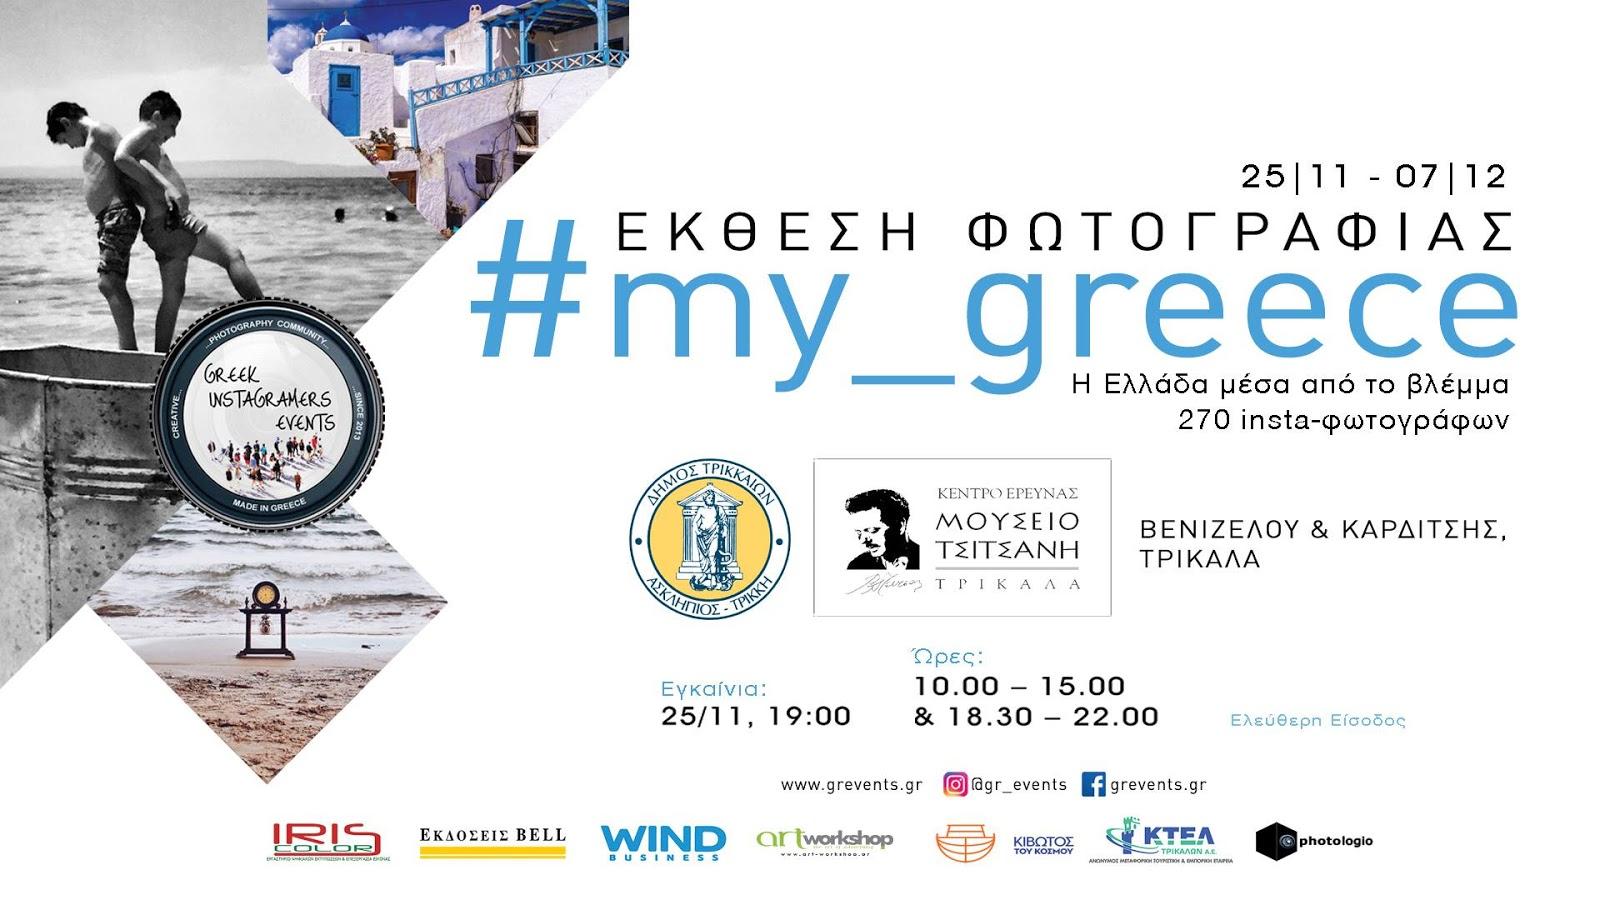 #my greece: 270 insta-φωτογράφοι εκθέτουν στο Μουσείο Τσιτσάνη στα Τρίκαλα